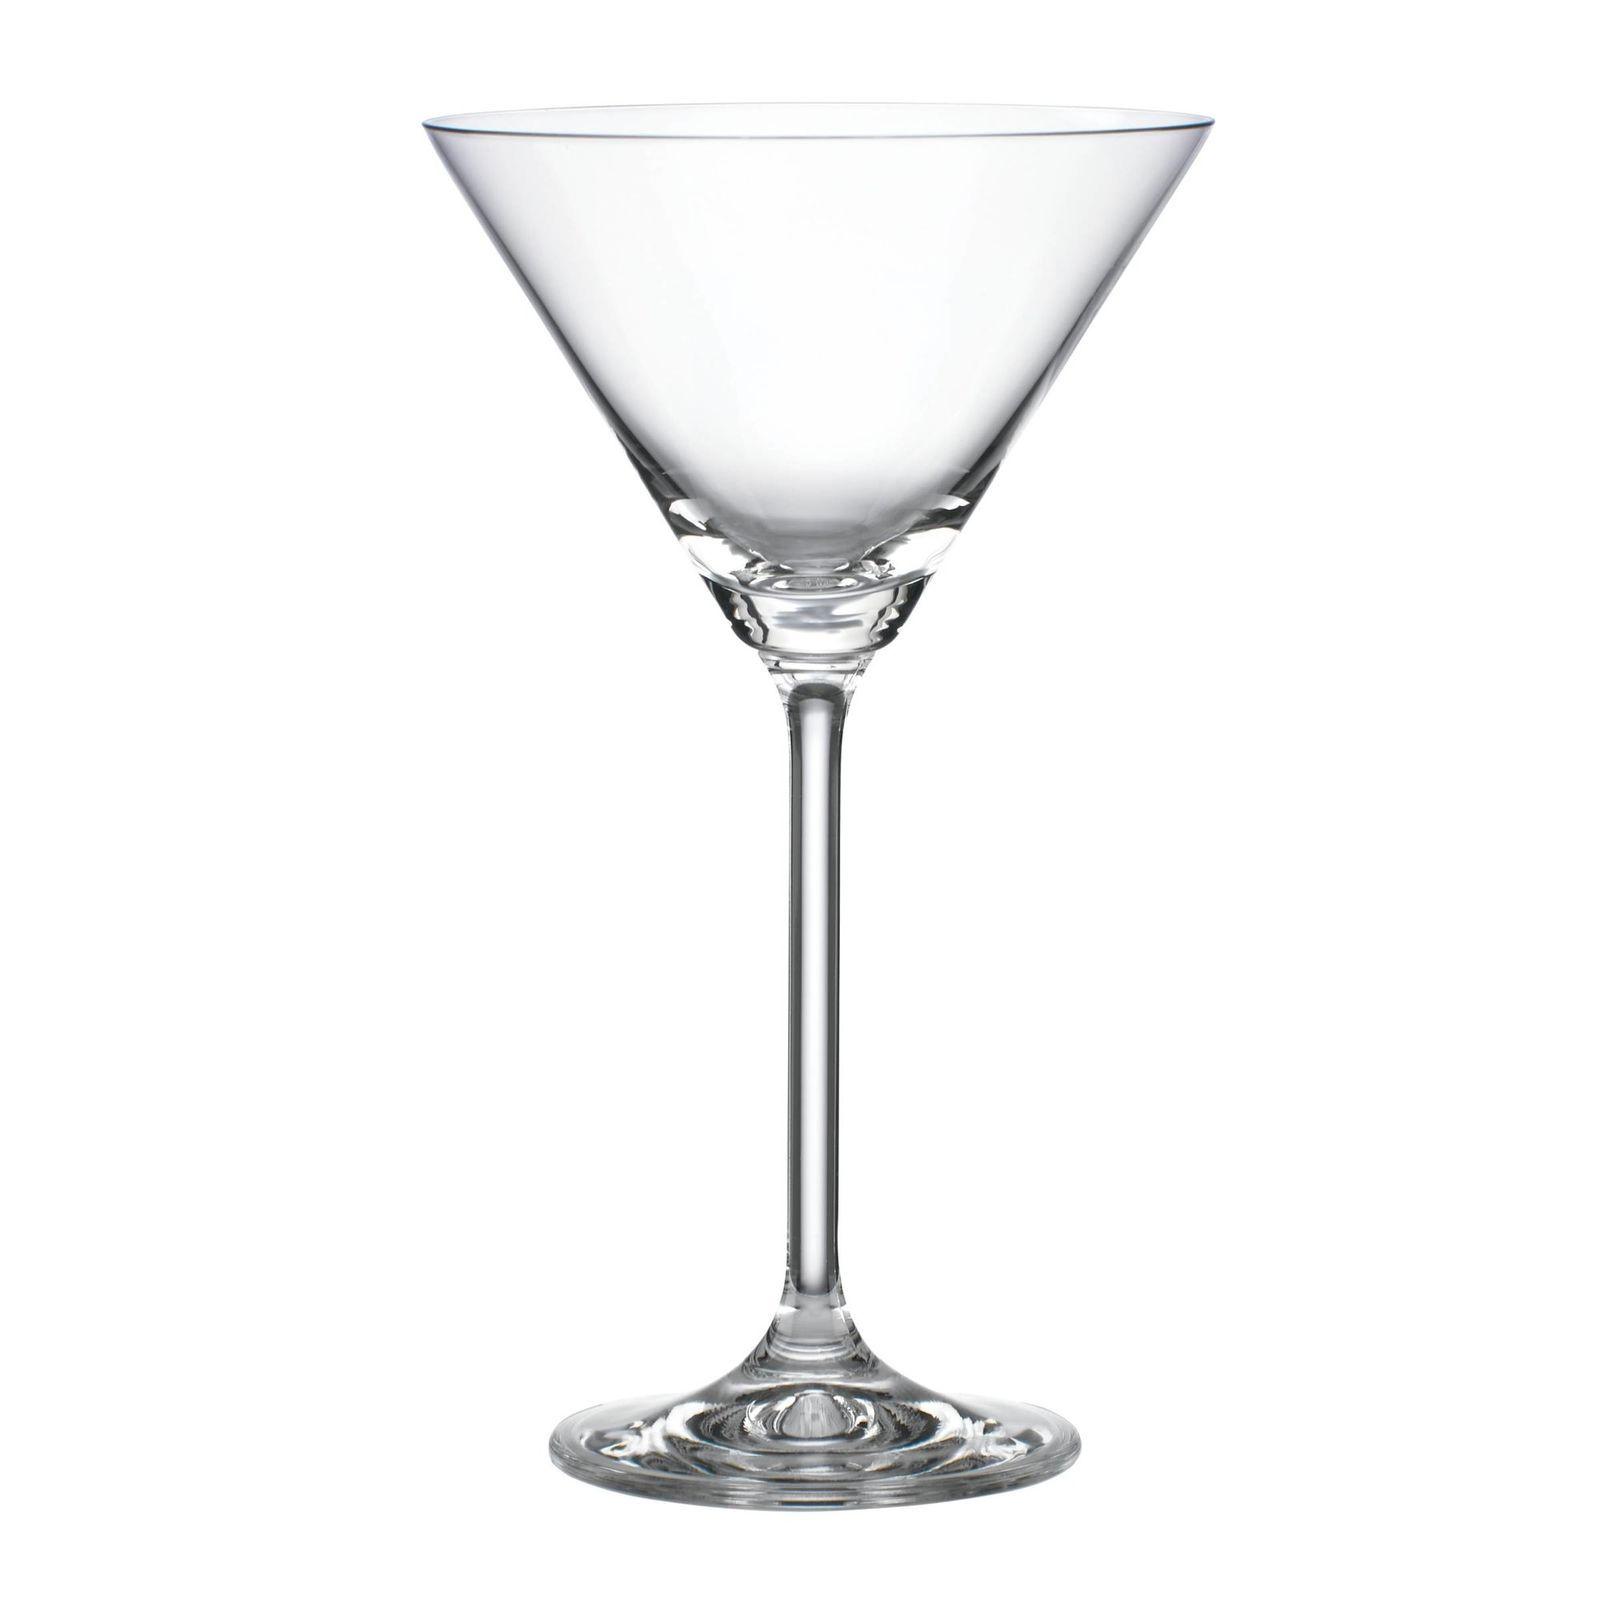 Lenox Tuscany Classics Cocktail Glass Set of 6 Opened box